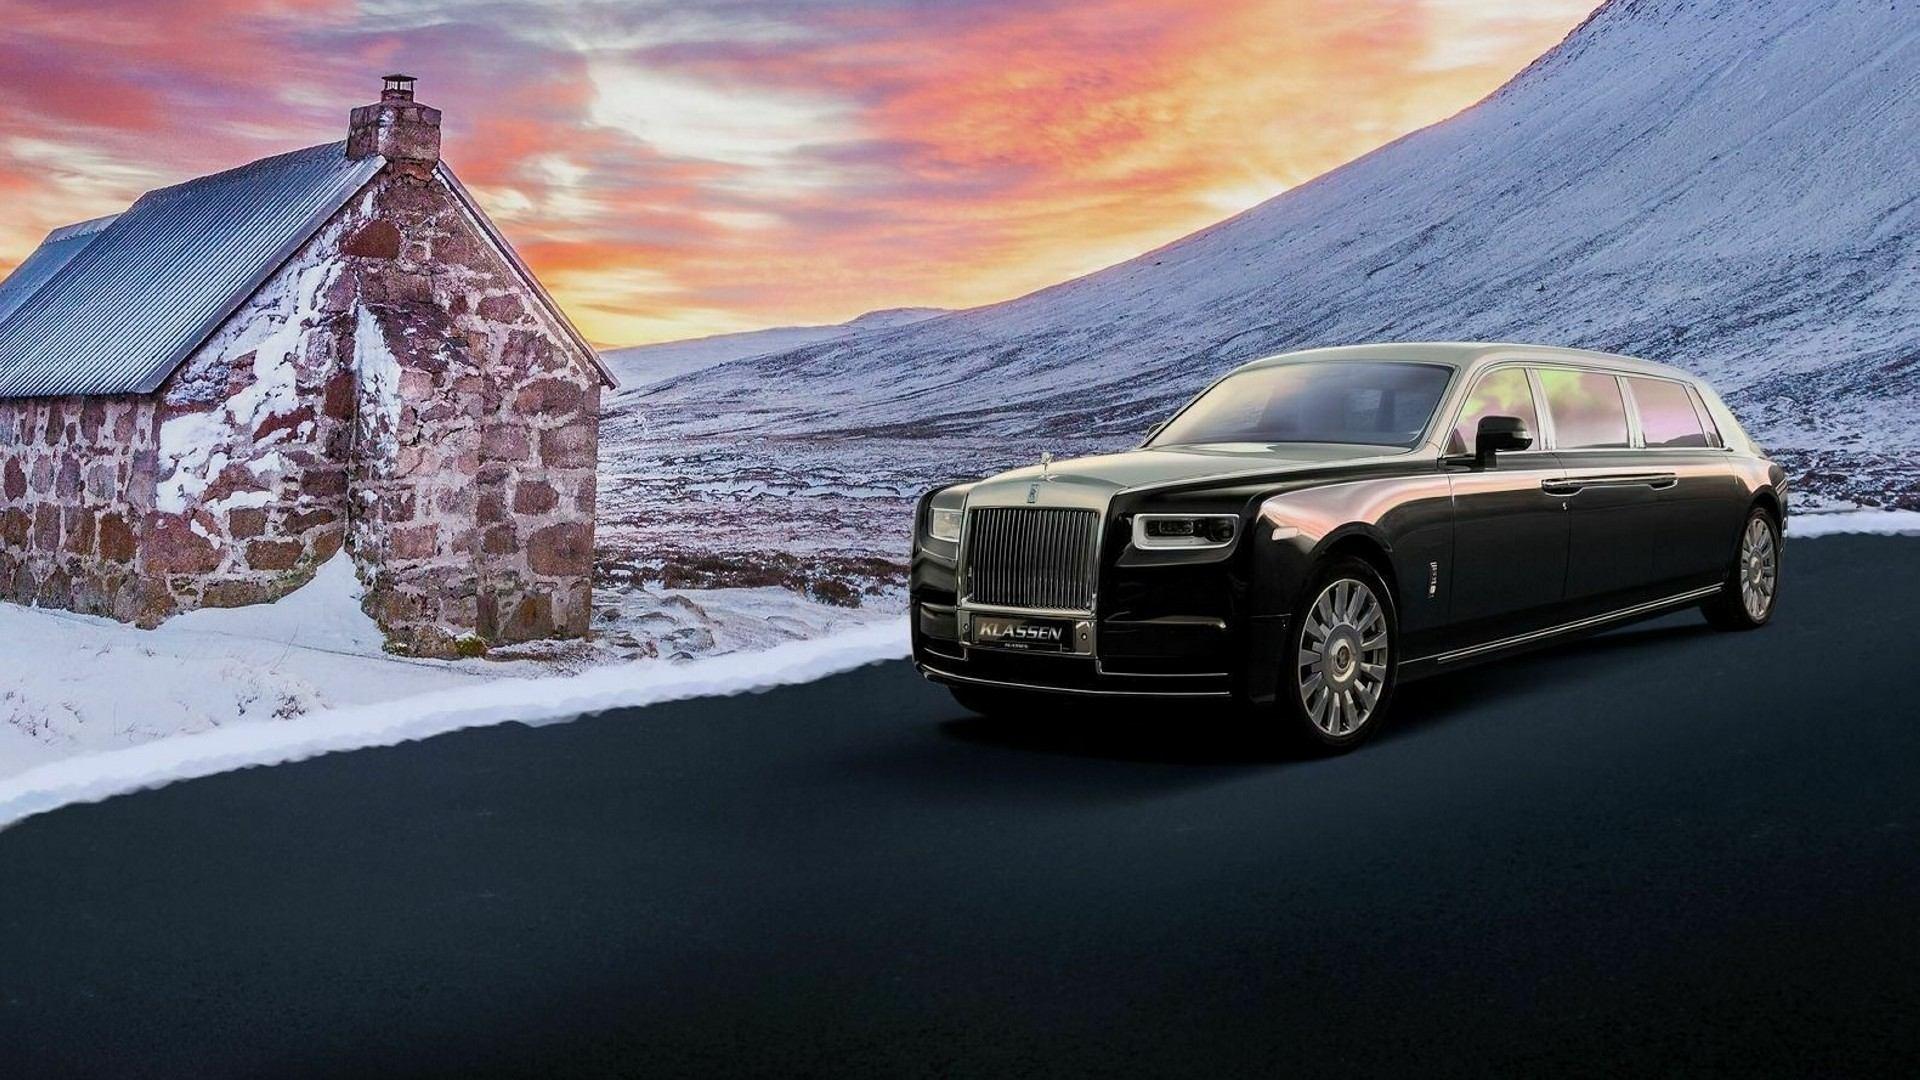 Klassen convierte en una limusina blindada al Rolls-Royce Phantom